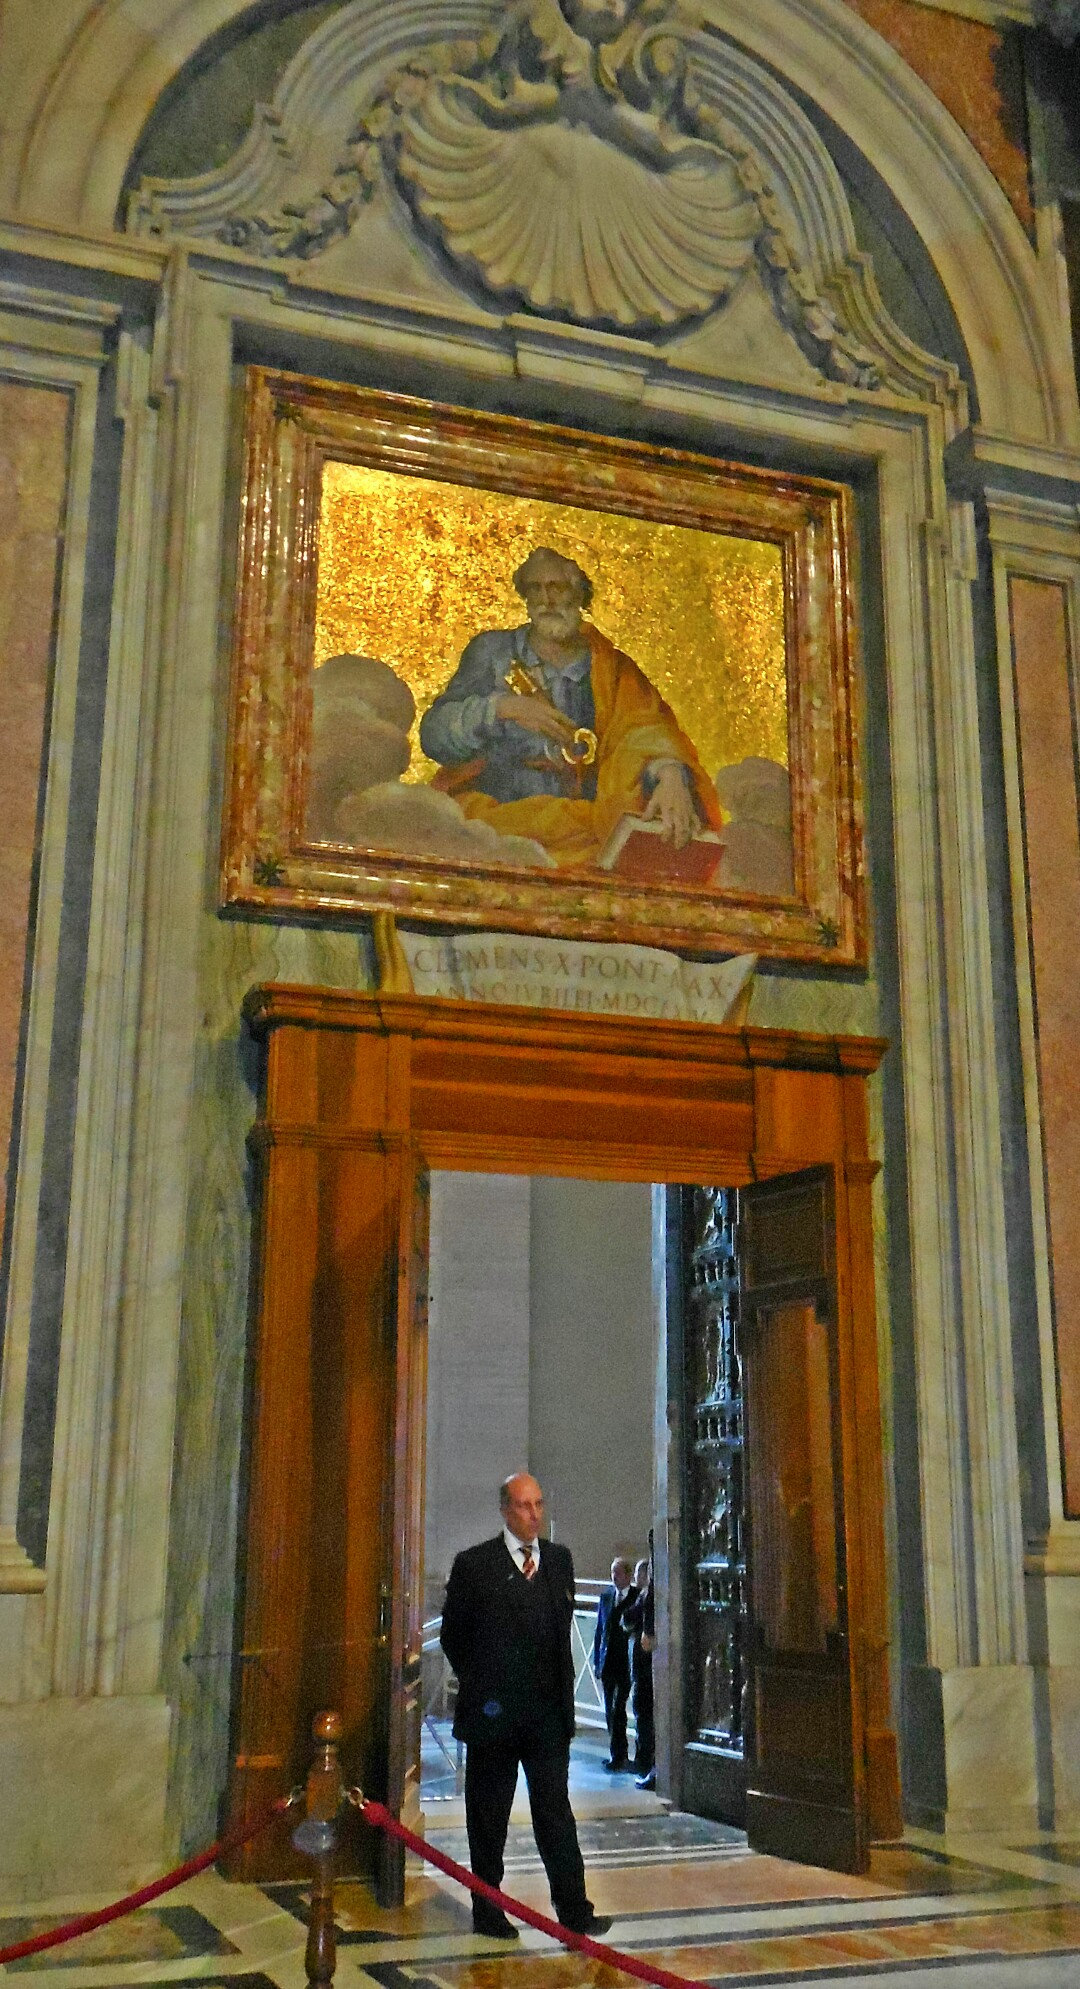 Porta Santa, St. Peter's Basilica